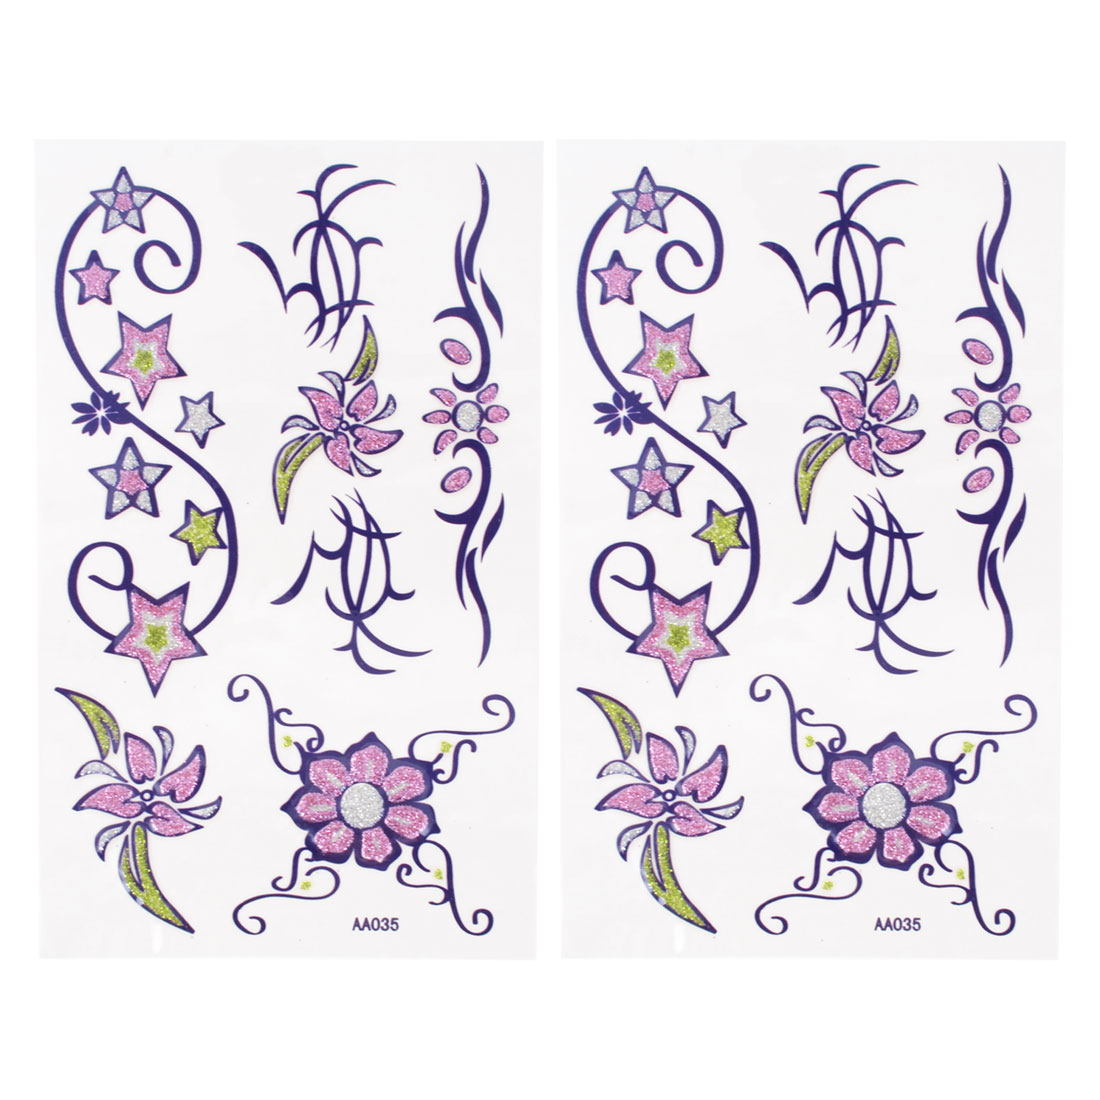 Skin Decorative Purple Flower Star Pattern Temporary Transfer Tattoos Stickers Set Beauty Tool 2pcs